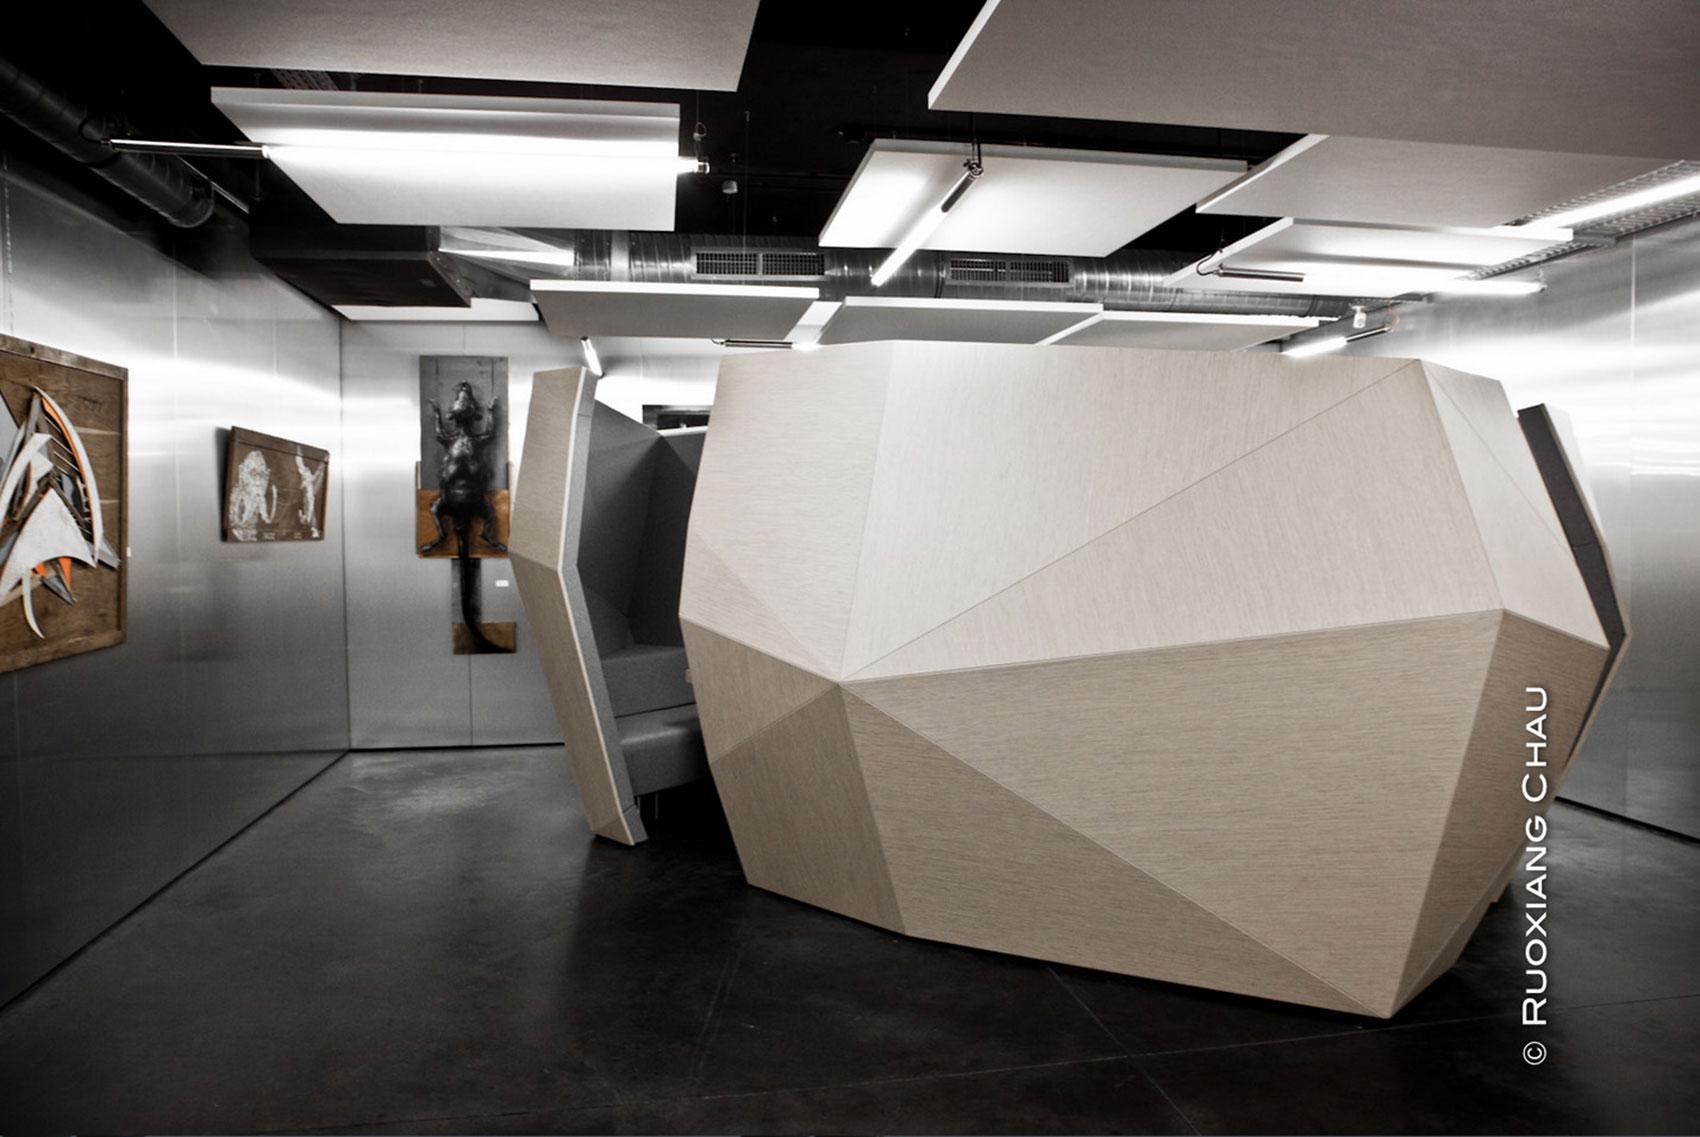 Ecole 42 - NOC 42 - AR Studio Architectures - Xavier NIEL - Kwame YAMGNANE - Florian BUCHER - Nicolas SADIRAC - Free - Reinventer Paris (8).jpg